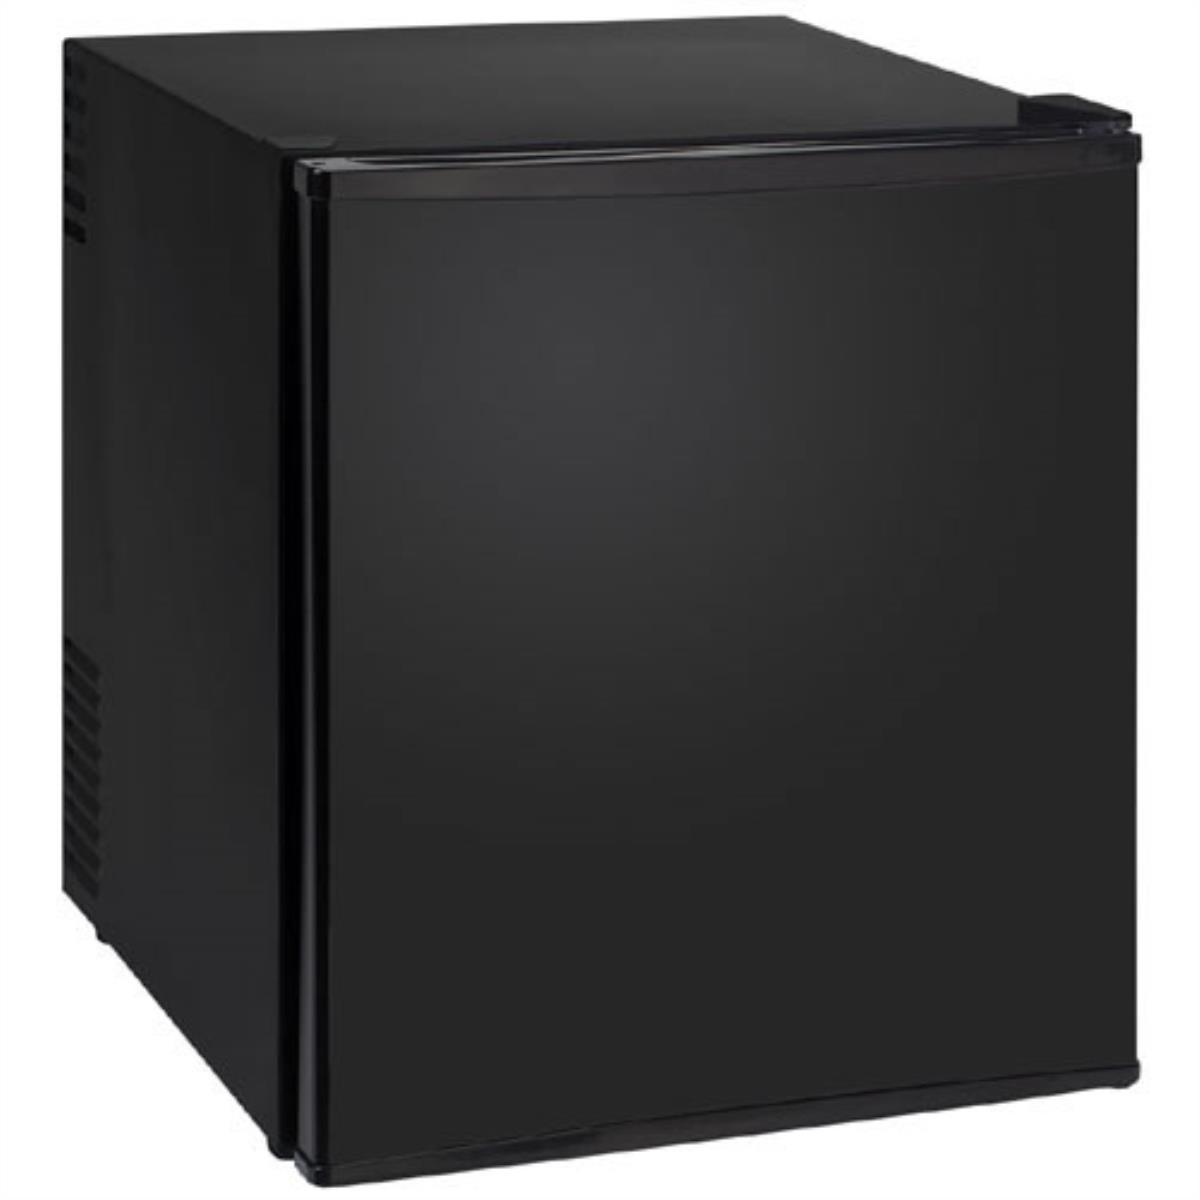 Avanti 1.7 Cu. Ft. Superconductor Refrigerator Black